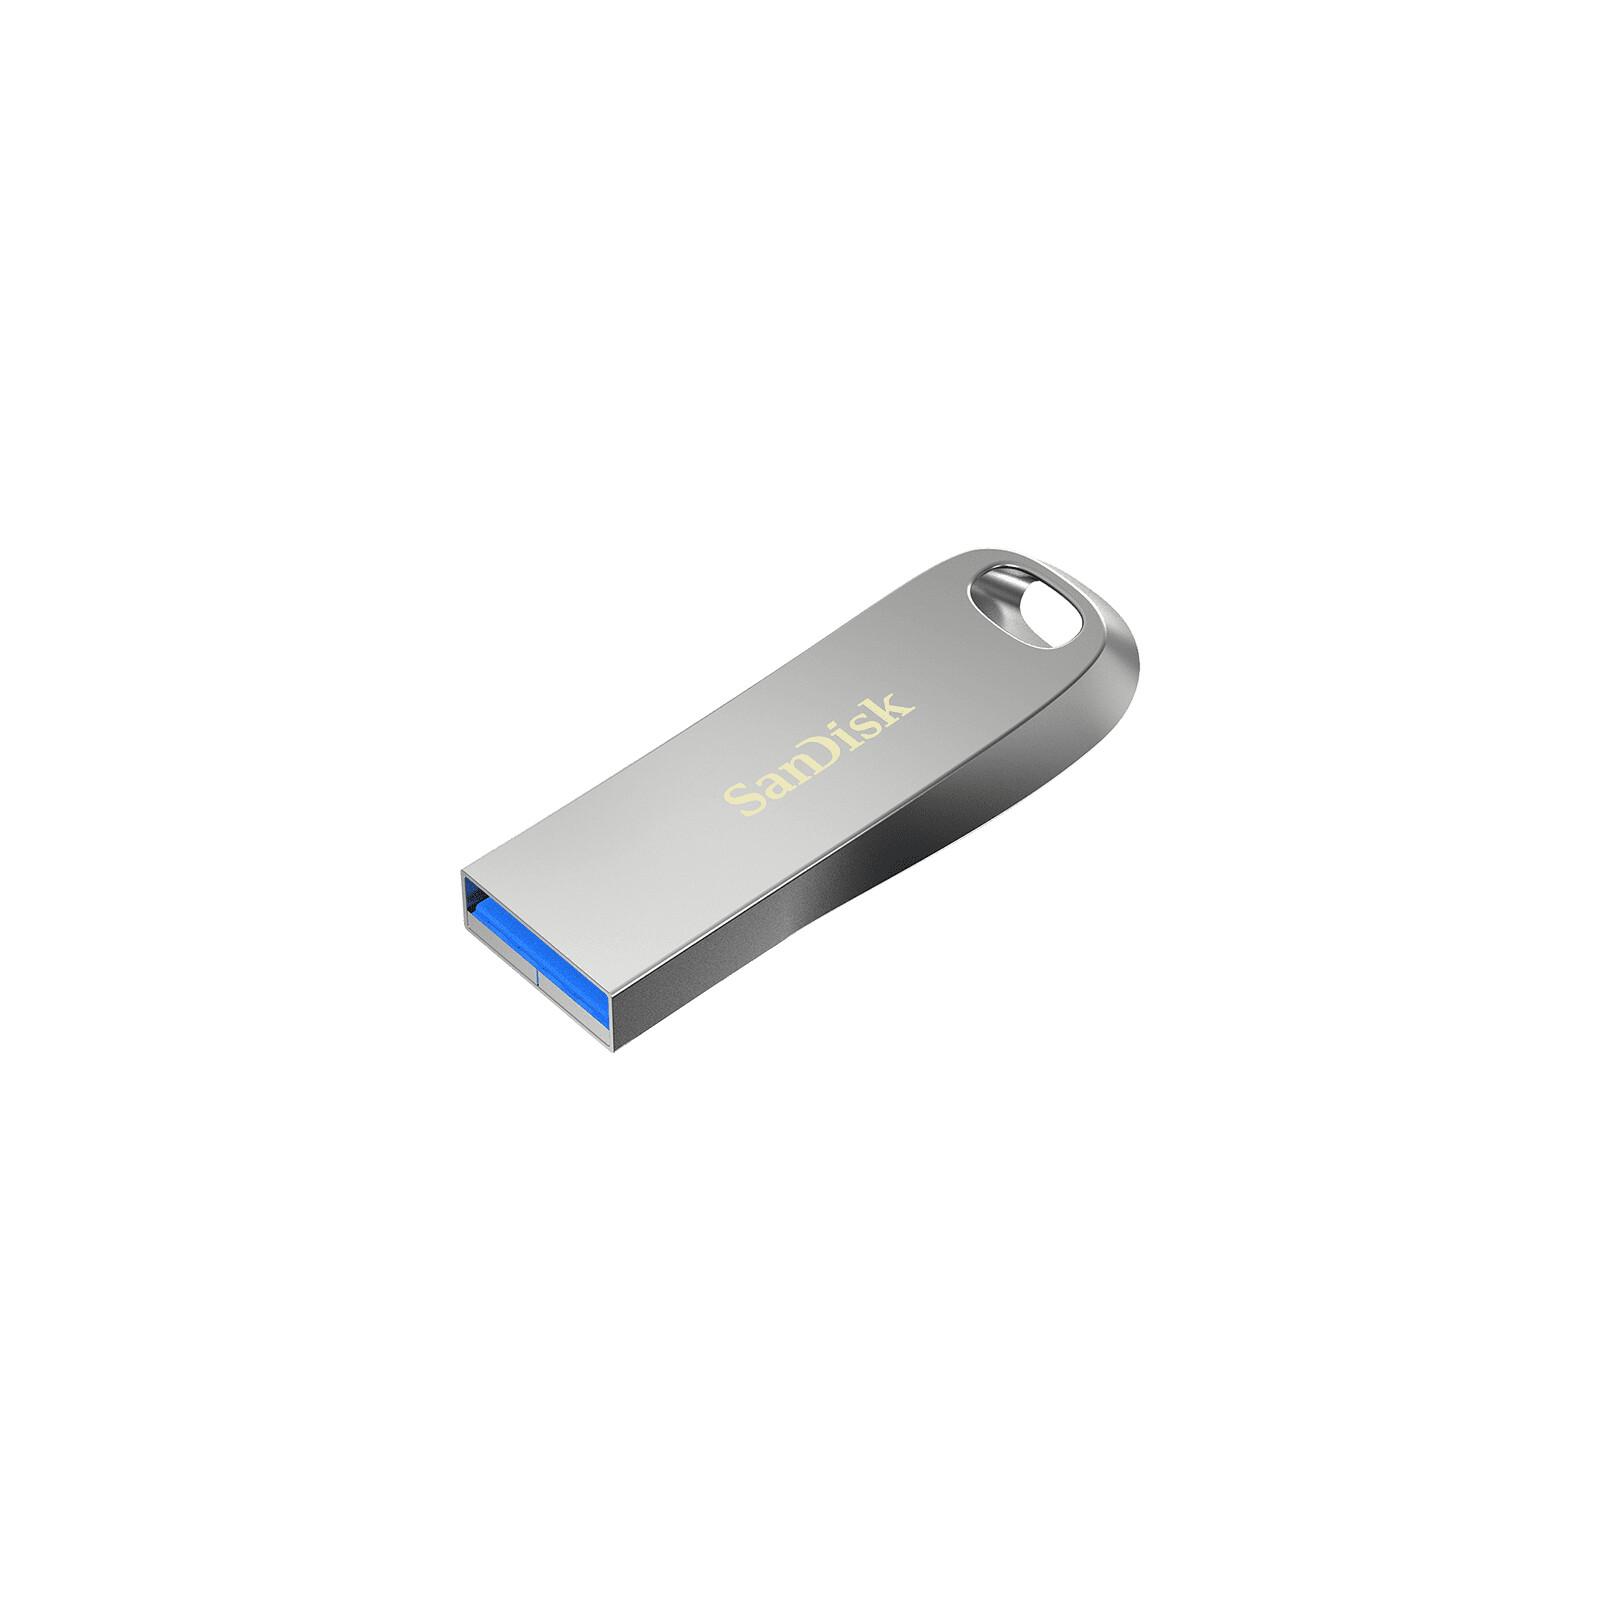 SanDisk Ultra Luxe USB 3.1 512GB 150Mbit/s